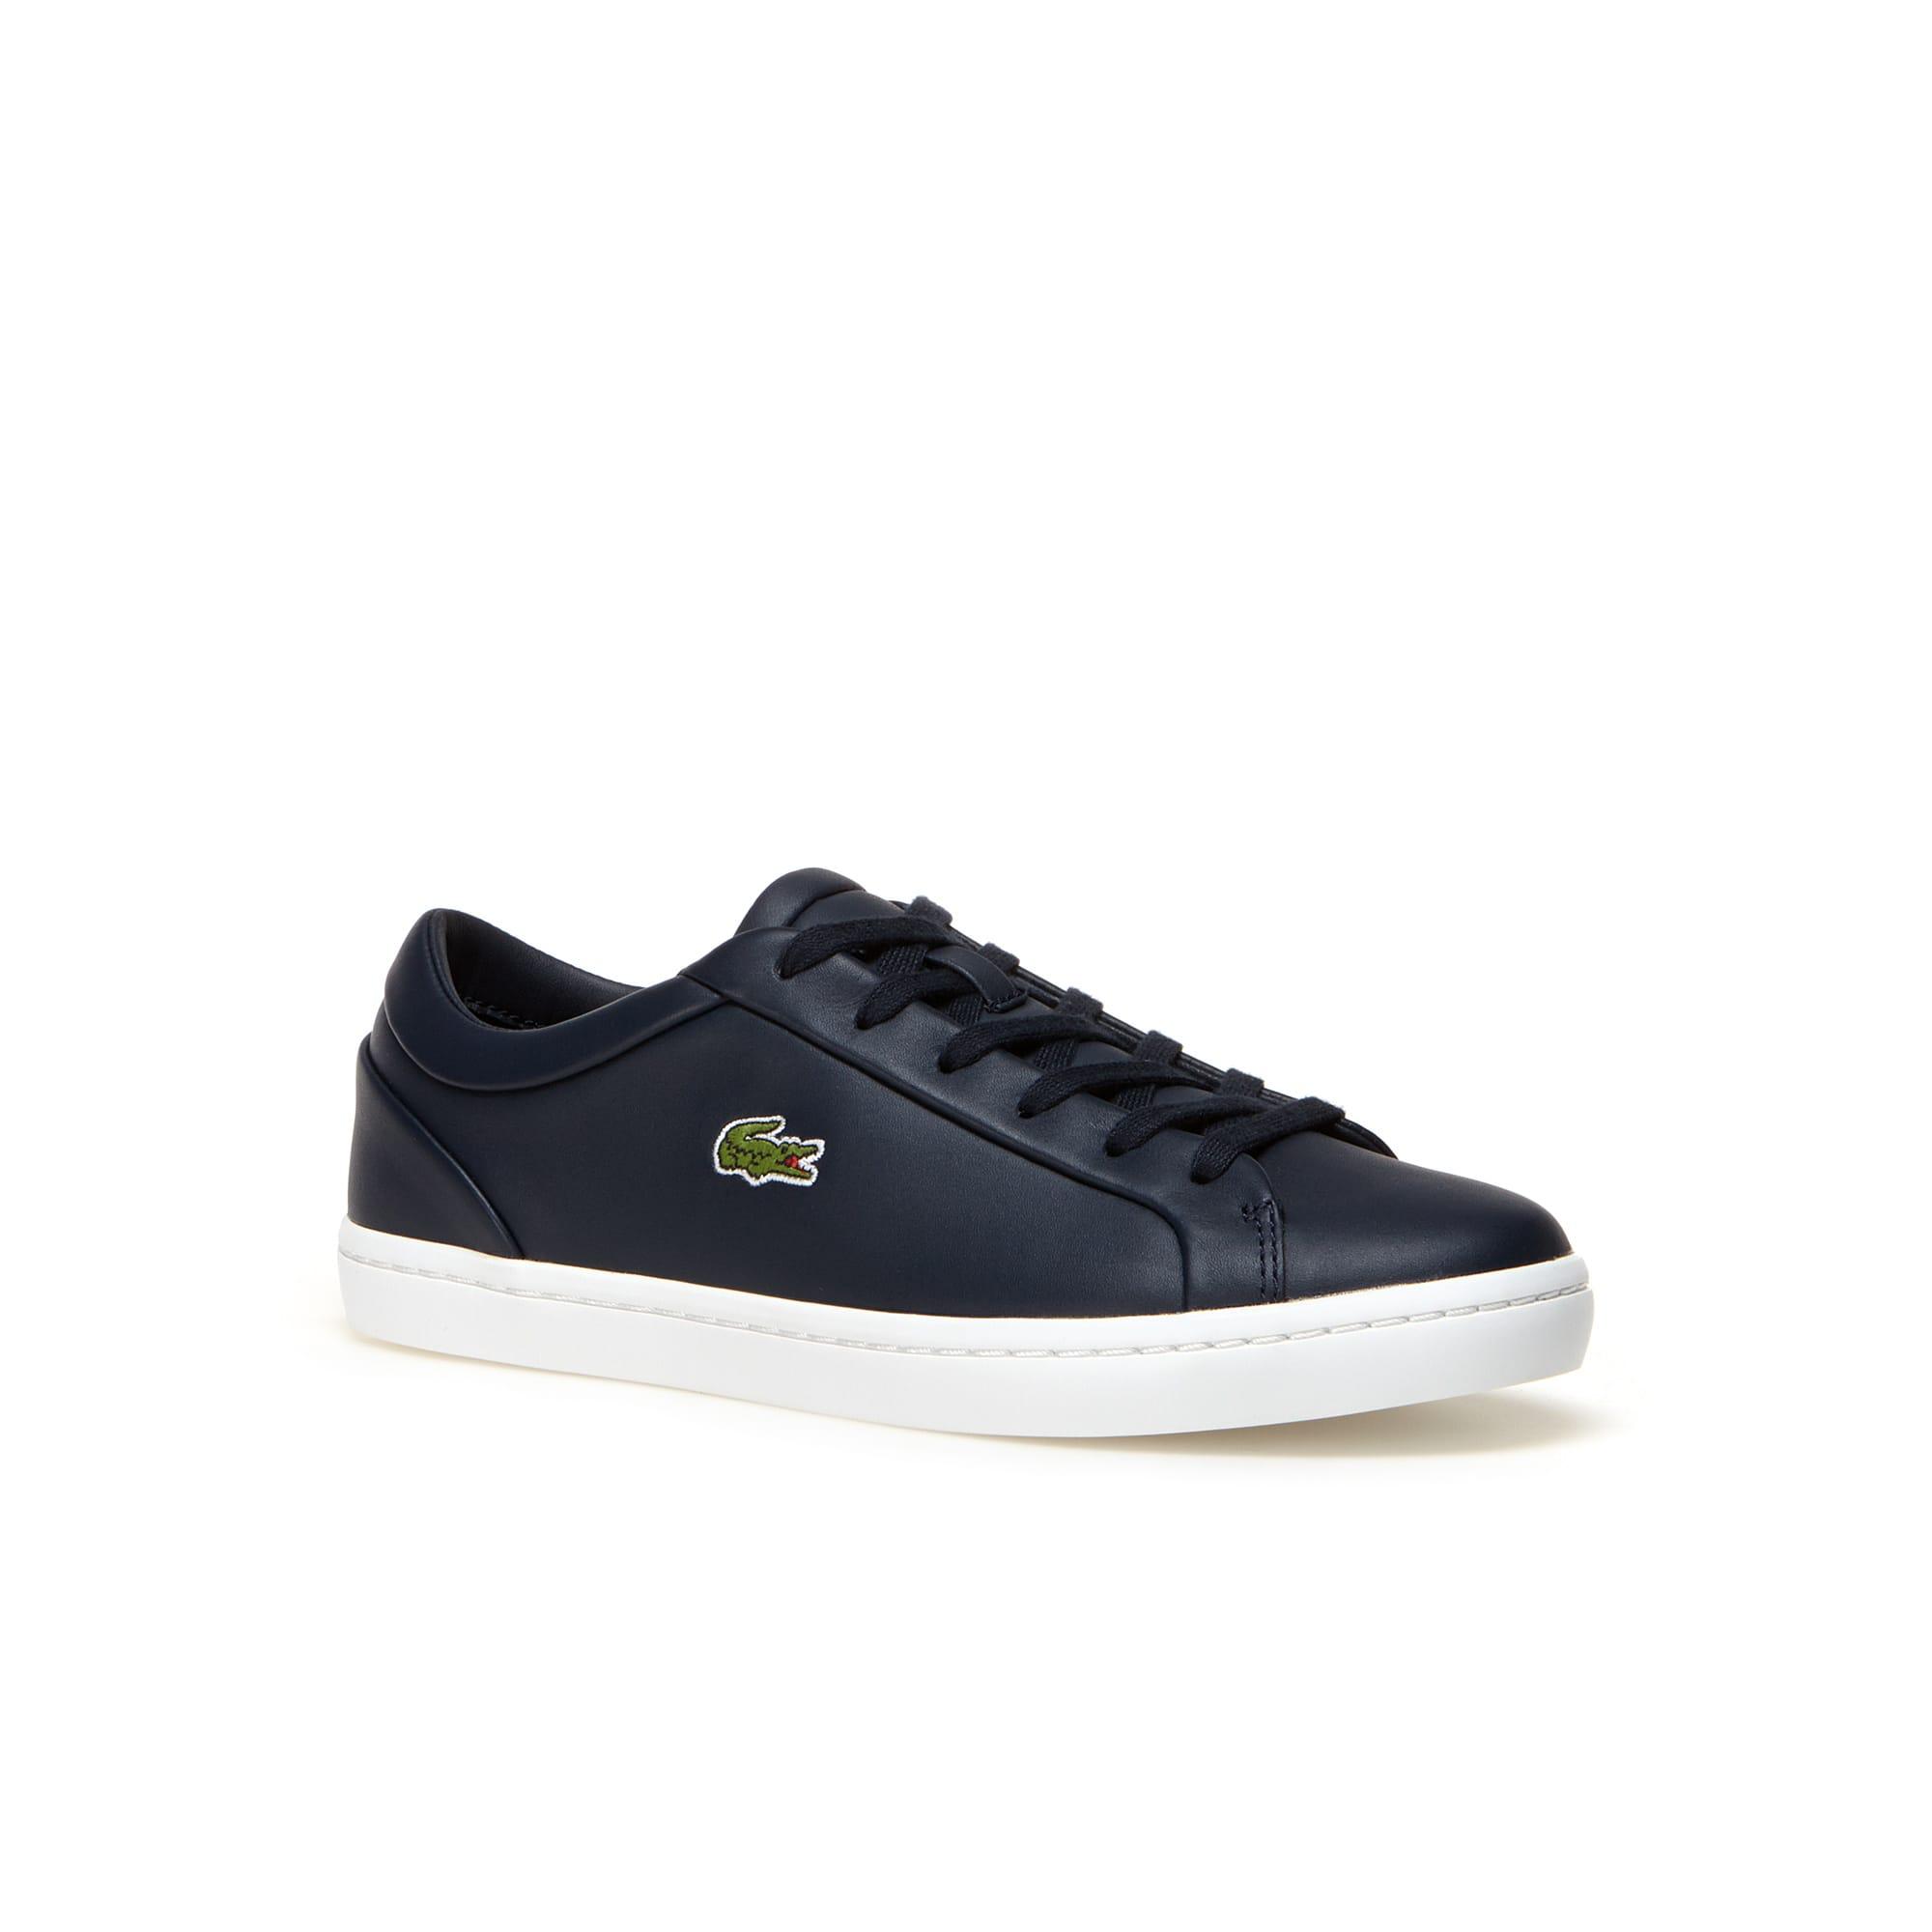 Womens Croc Tennis Shoes